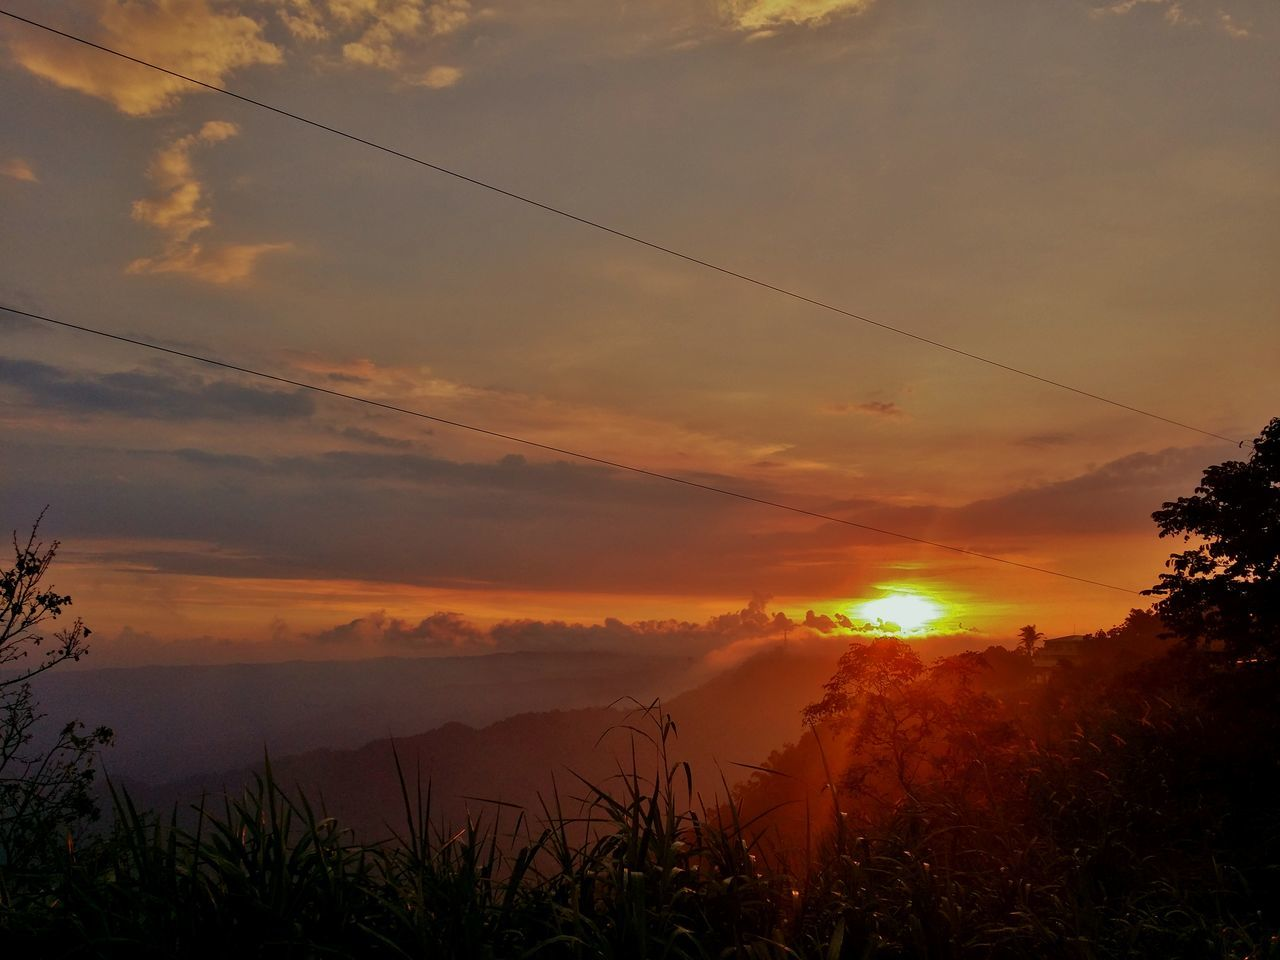 Sunset in Tagaytay #EyeemPhilippines #sunset #Tagaytay Light Majestic